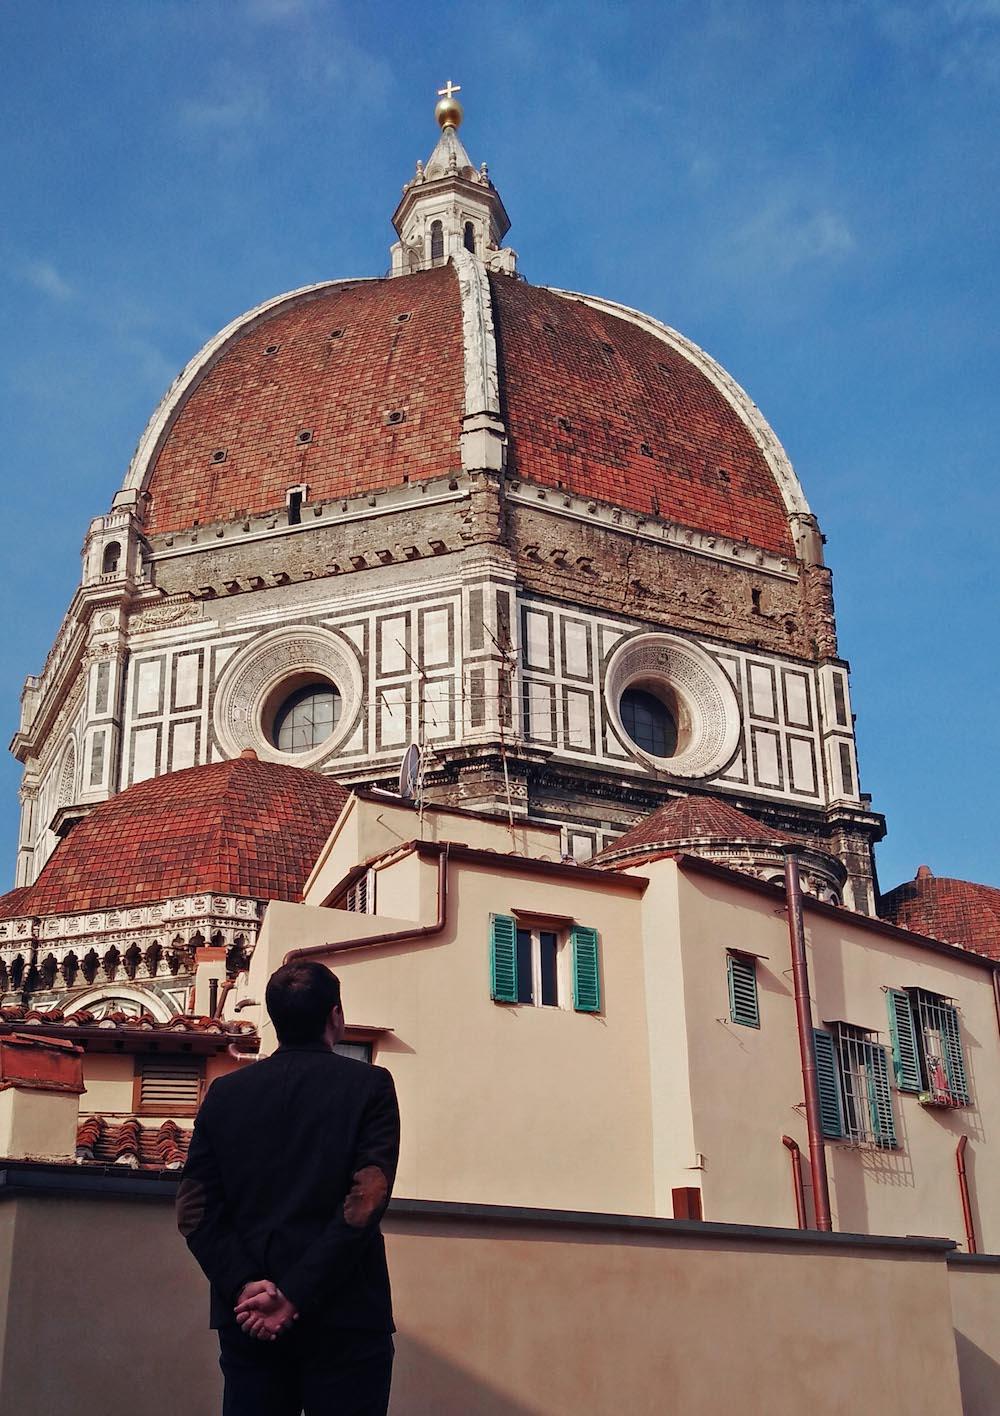 A Tuscan dome